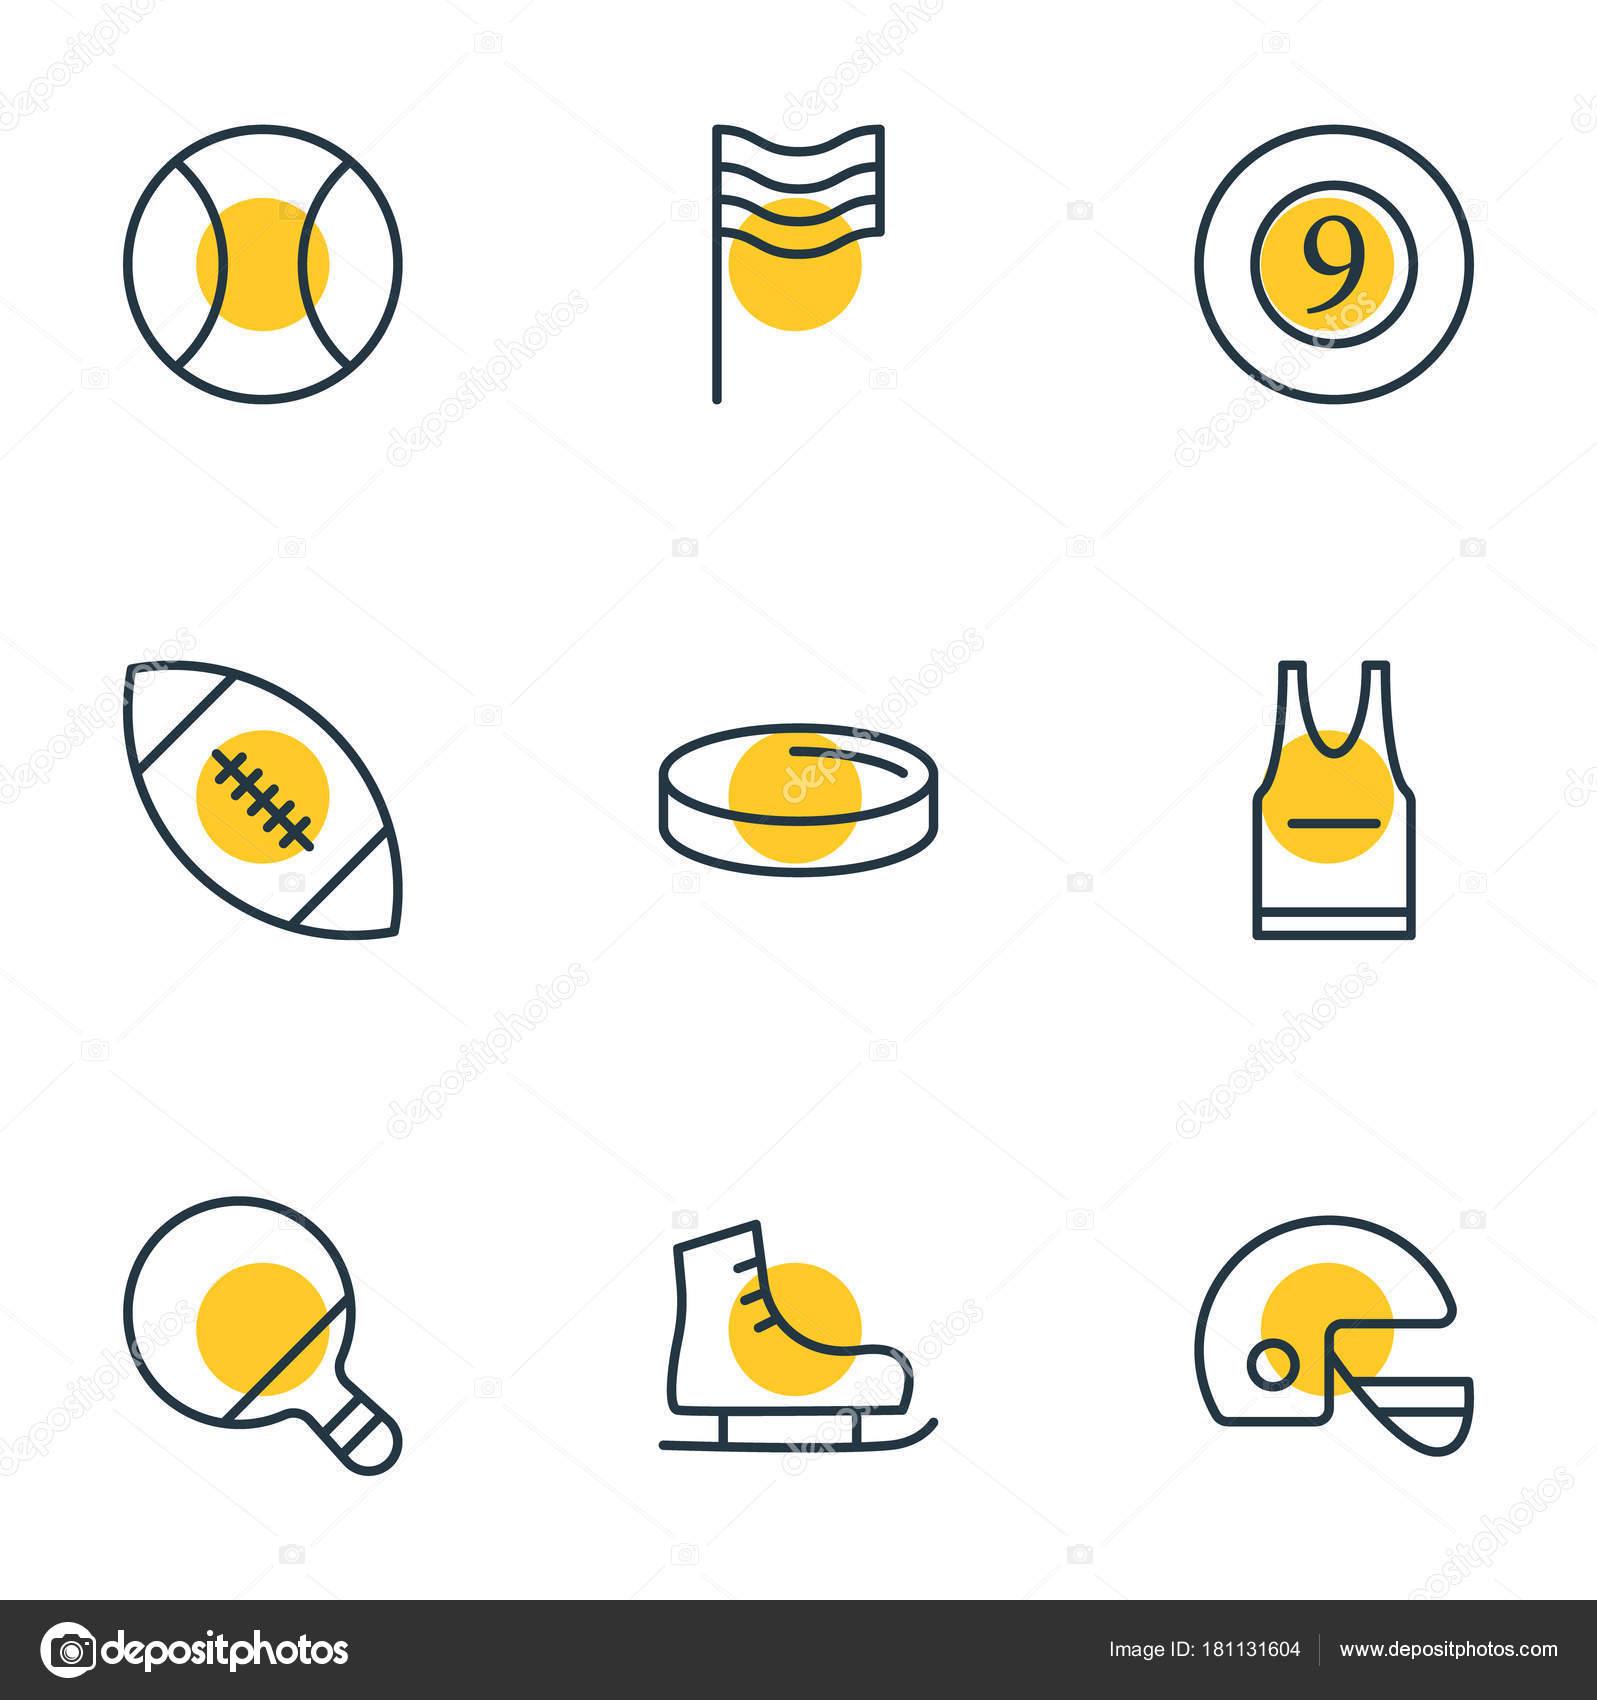 Vector illustration of 9 fitness icons line style. Editable set of skates 9629e29b86c7